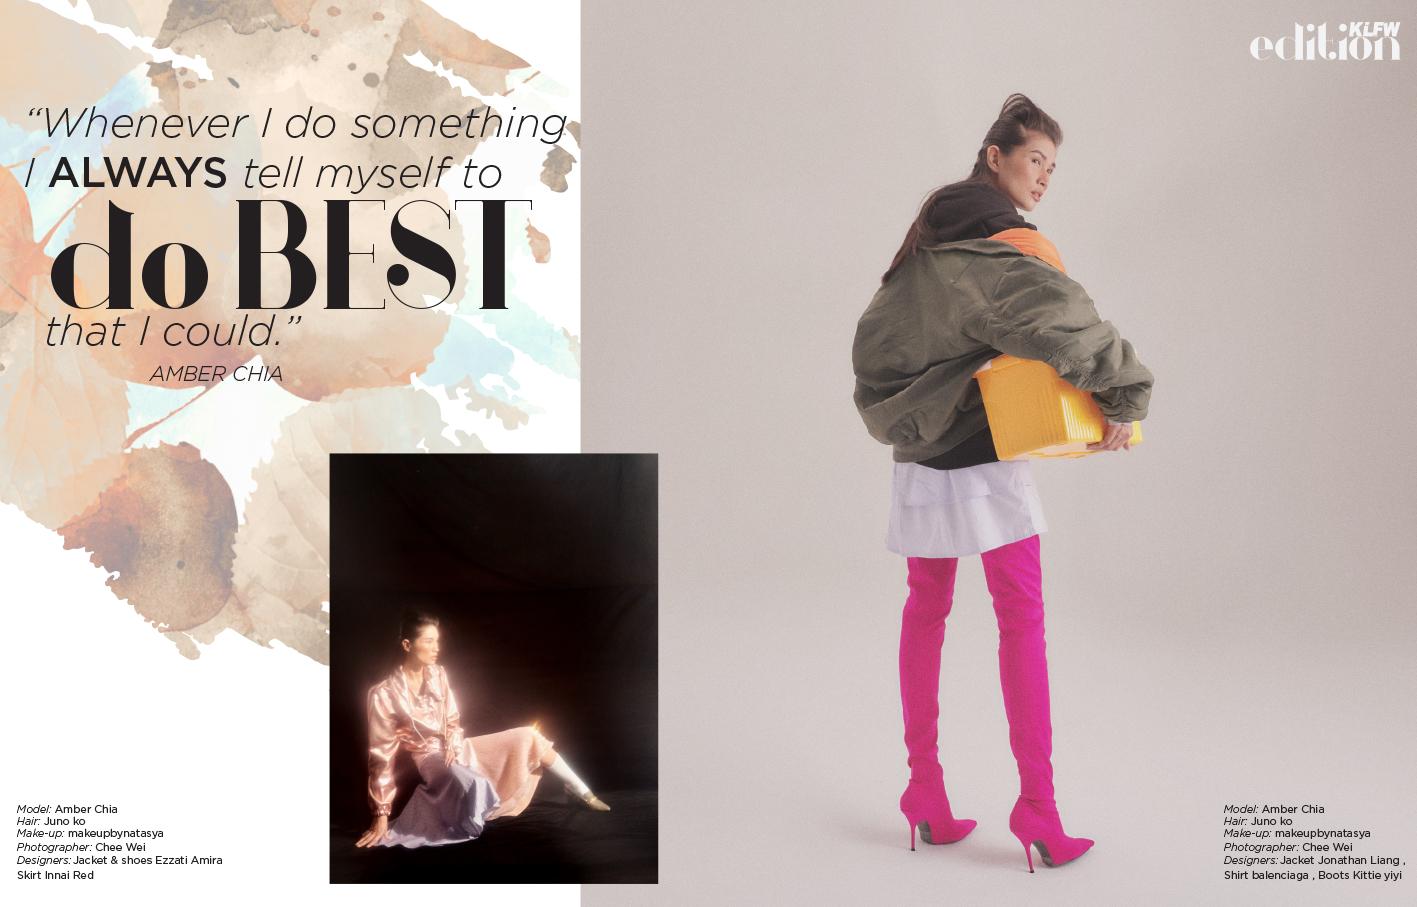 Model: Amber Chia Hair:  Juno ko , Make-up:  makeupbynatasya , Photographer:  Chee Wei , Designers: Left / Jacket & shoes Ezzati Amira Skirt Innai Red, Right / Jacket  Jonathan Liang , Boots  Kittie Yiyi  , Shirt  Balenciaga